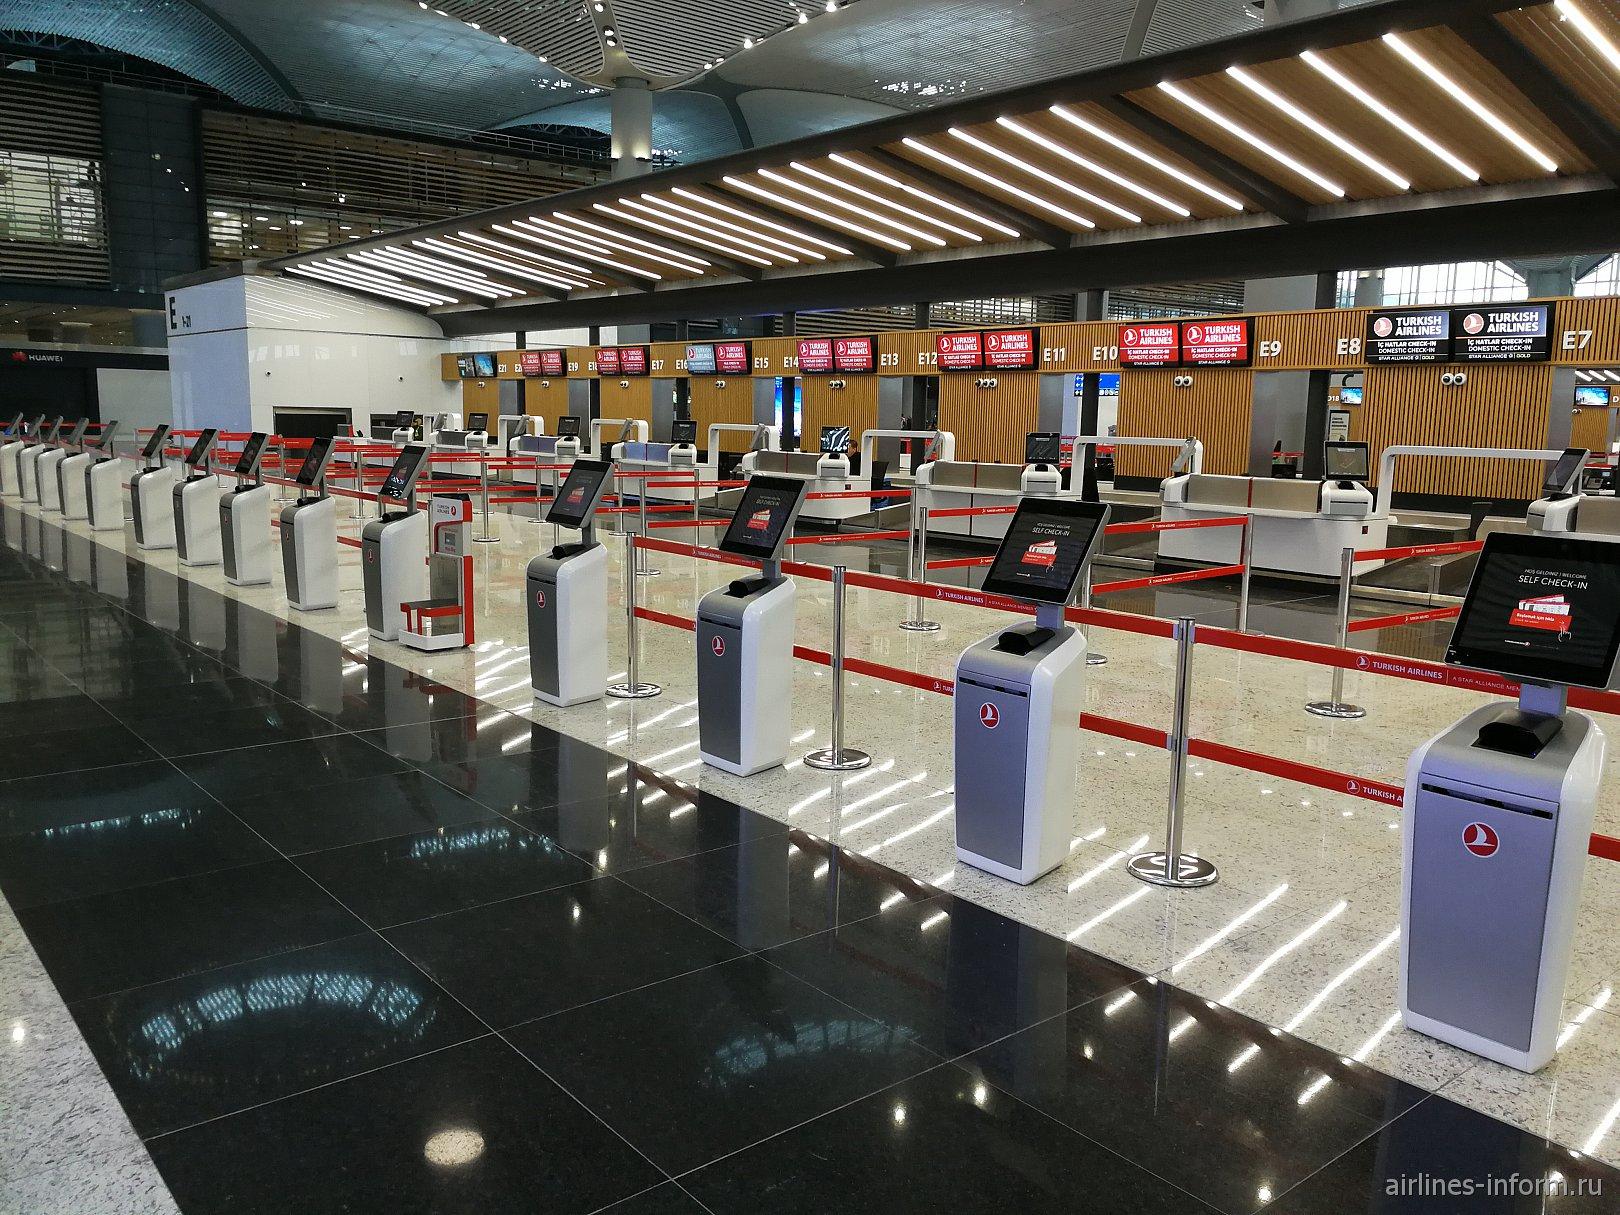 Зона регистрации Турецких авиалиний в новом аэропорту Стамбула